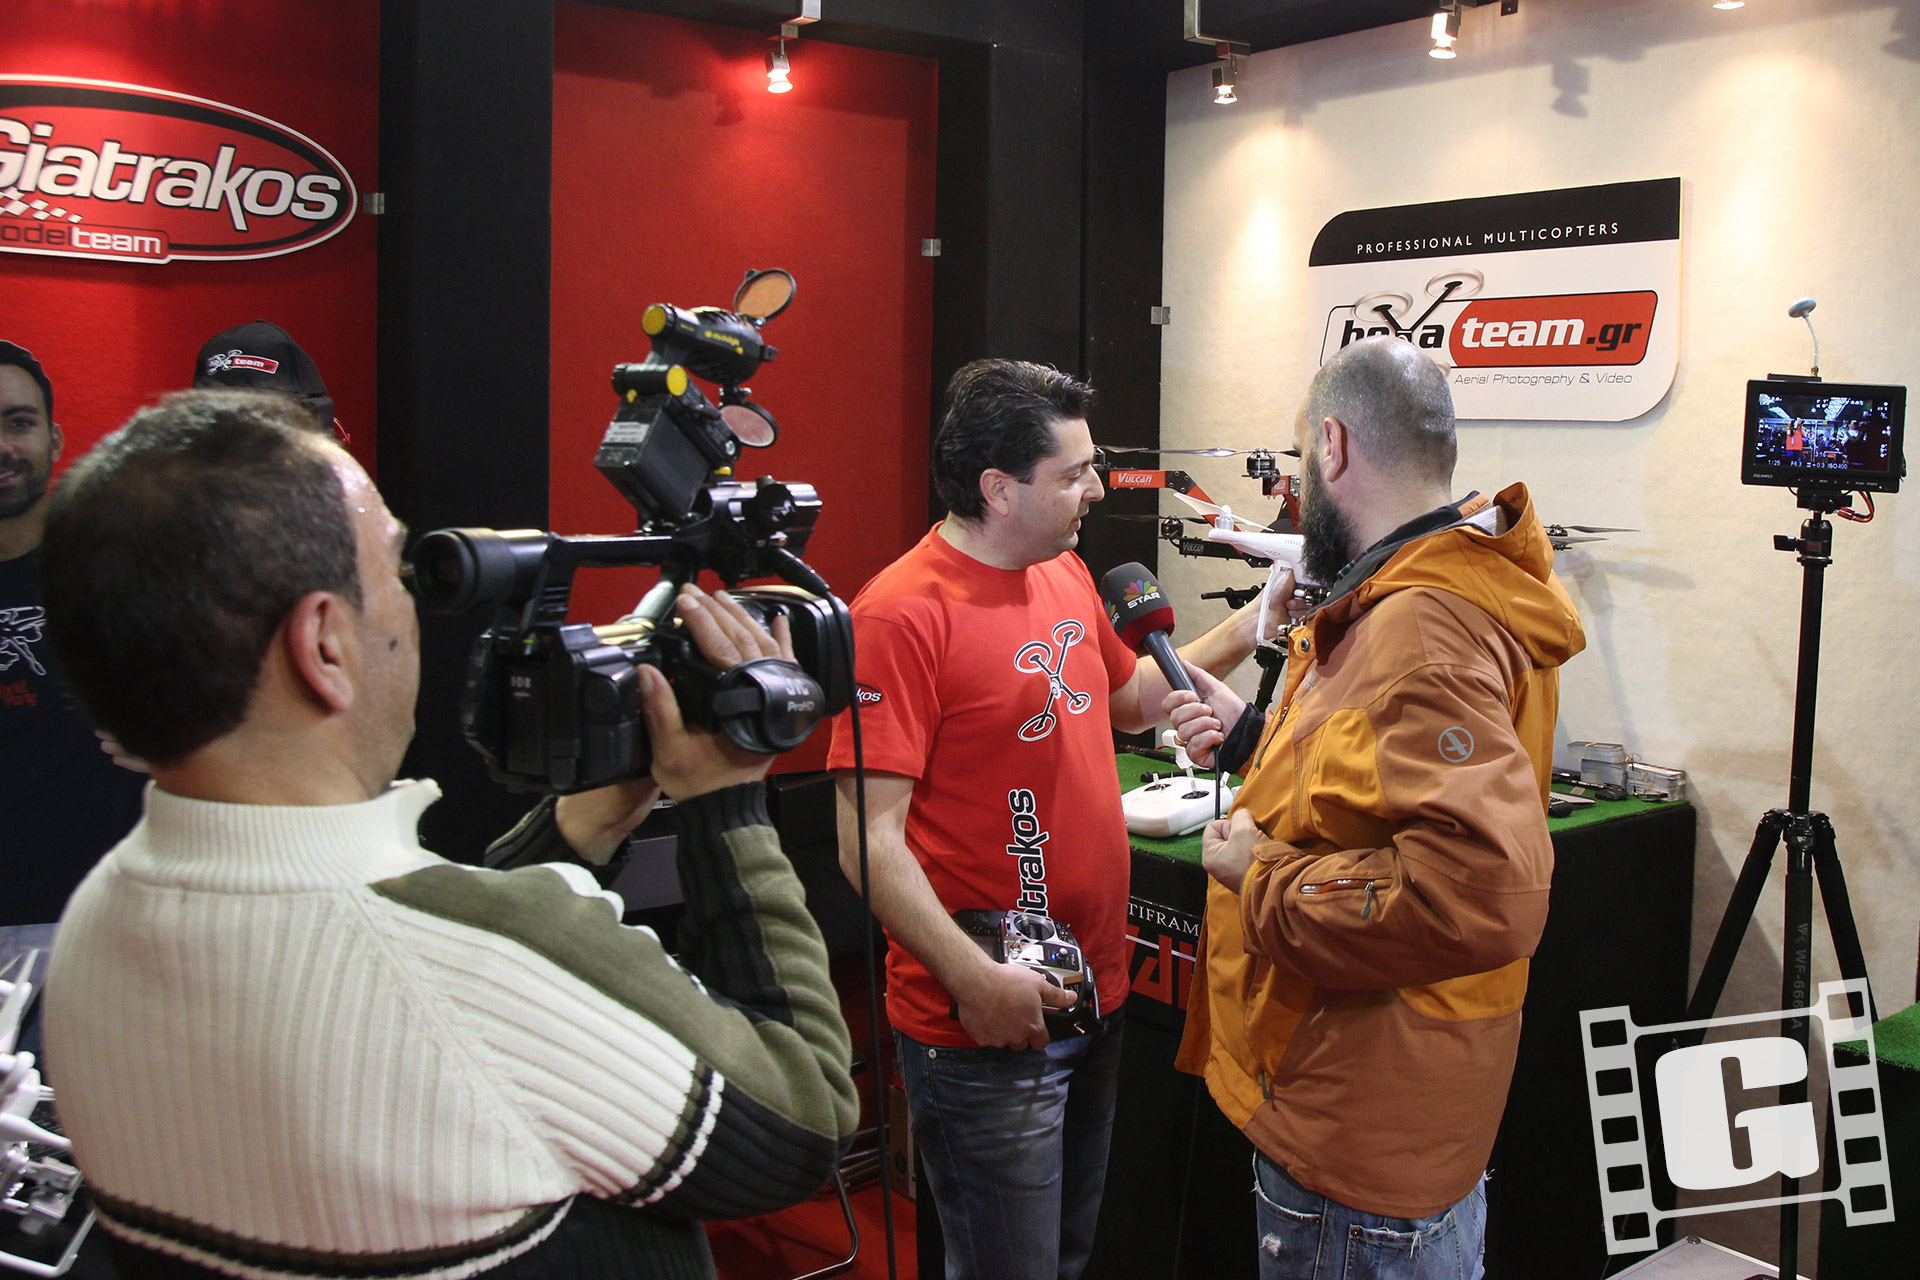 photovision 2015, drone, Greece, SMIEA, Giatrakos Chris, hexateam, TV, STAR CHANNEL